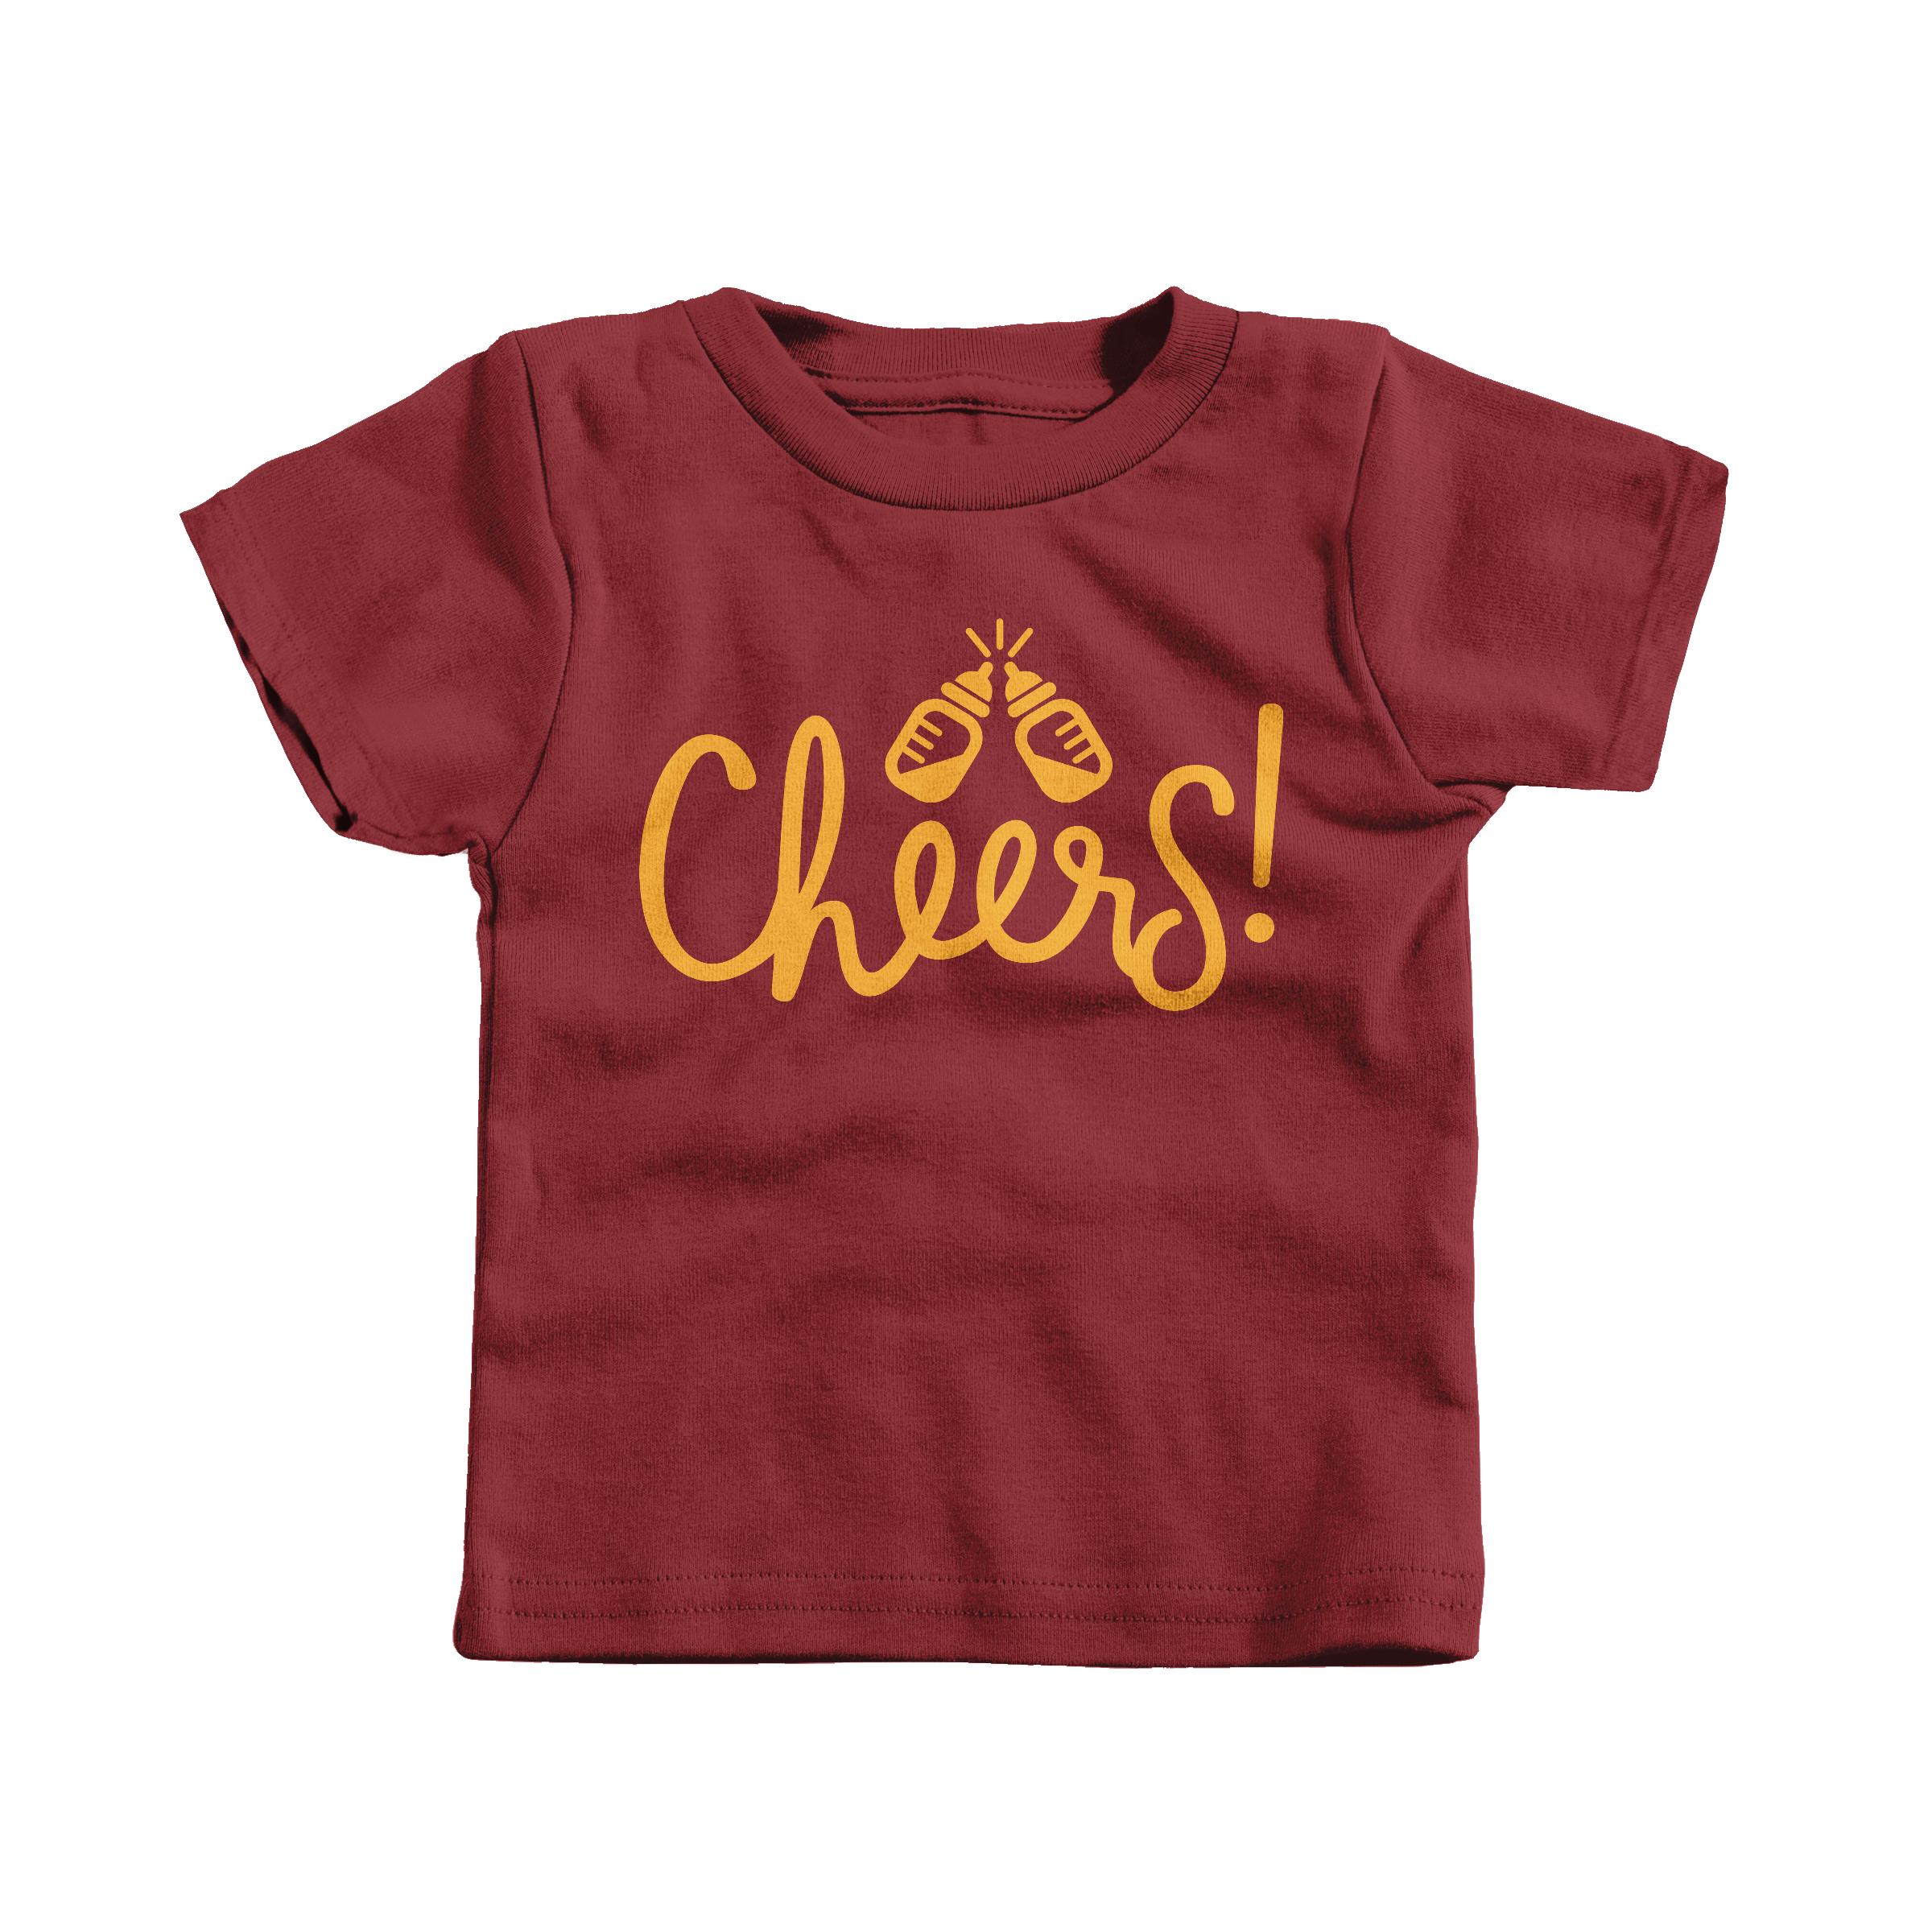 Cheers! Garnet (T-Shirt)